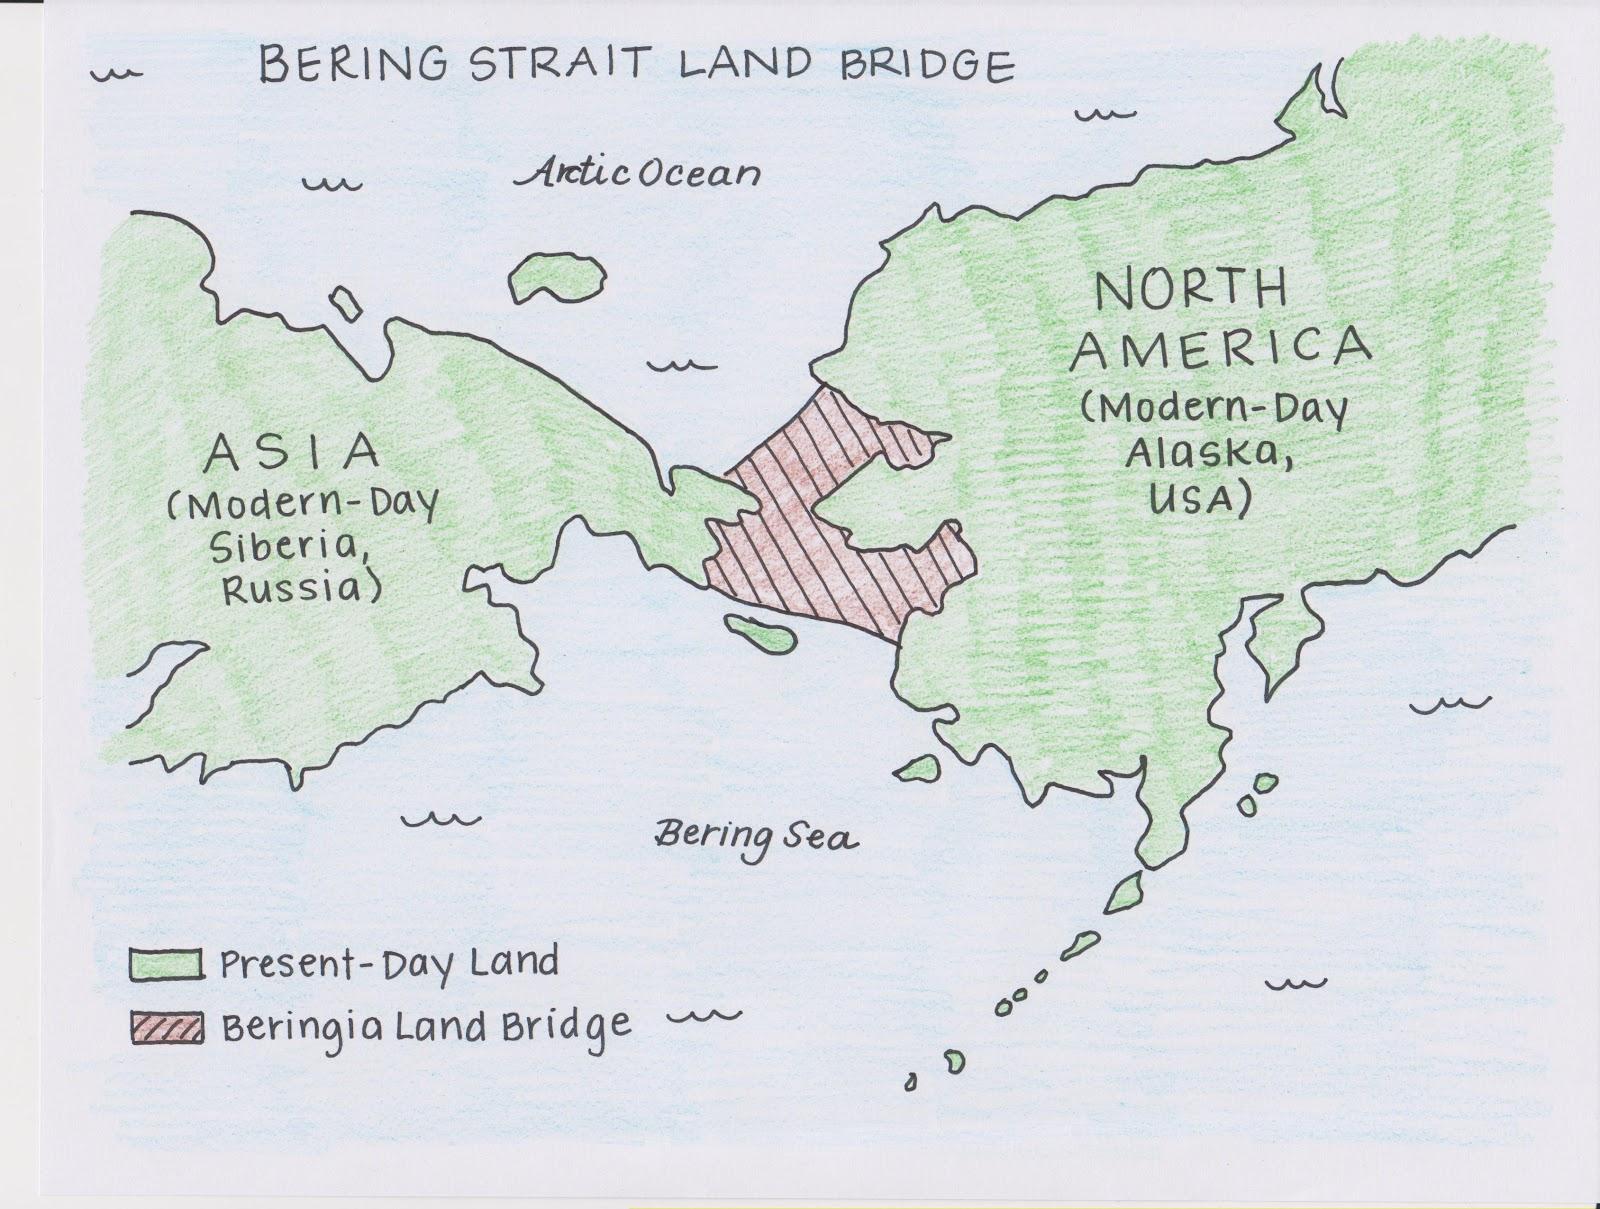 World Map Bering Strait.Spencespace Understanding The Bering Strait Land Bridge